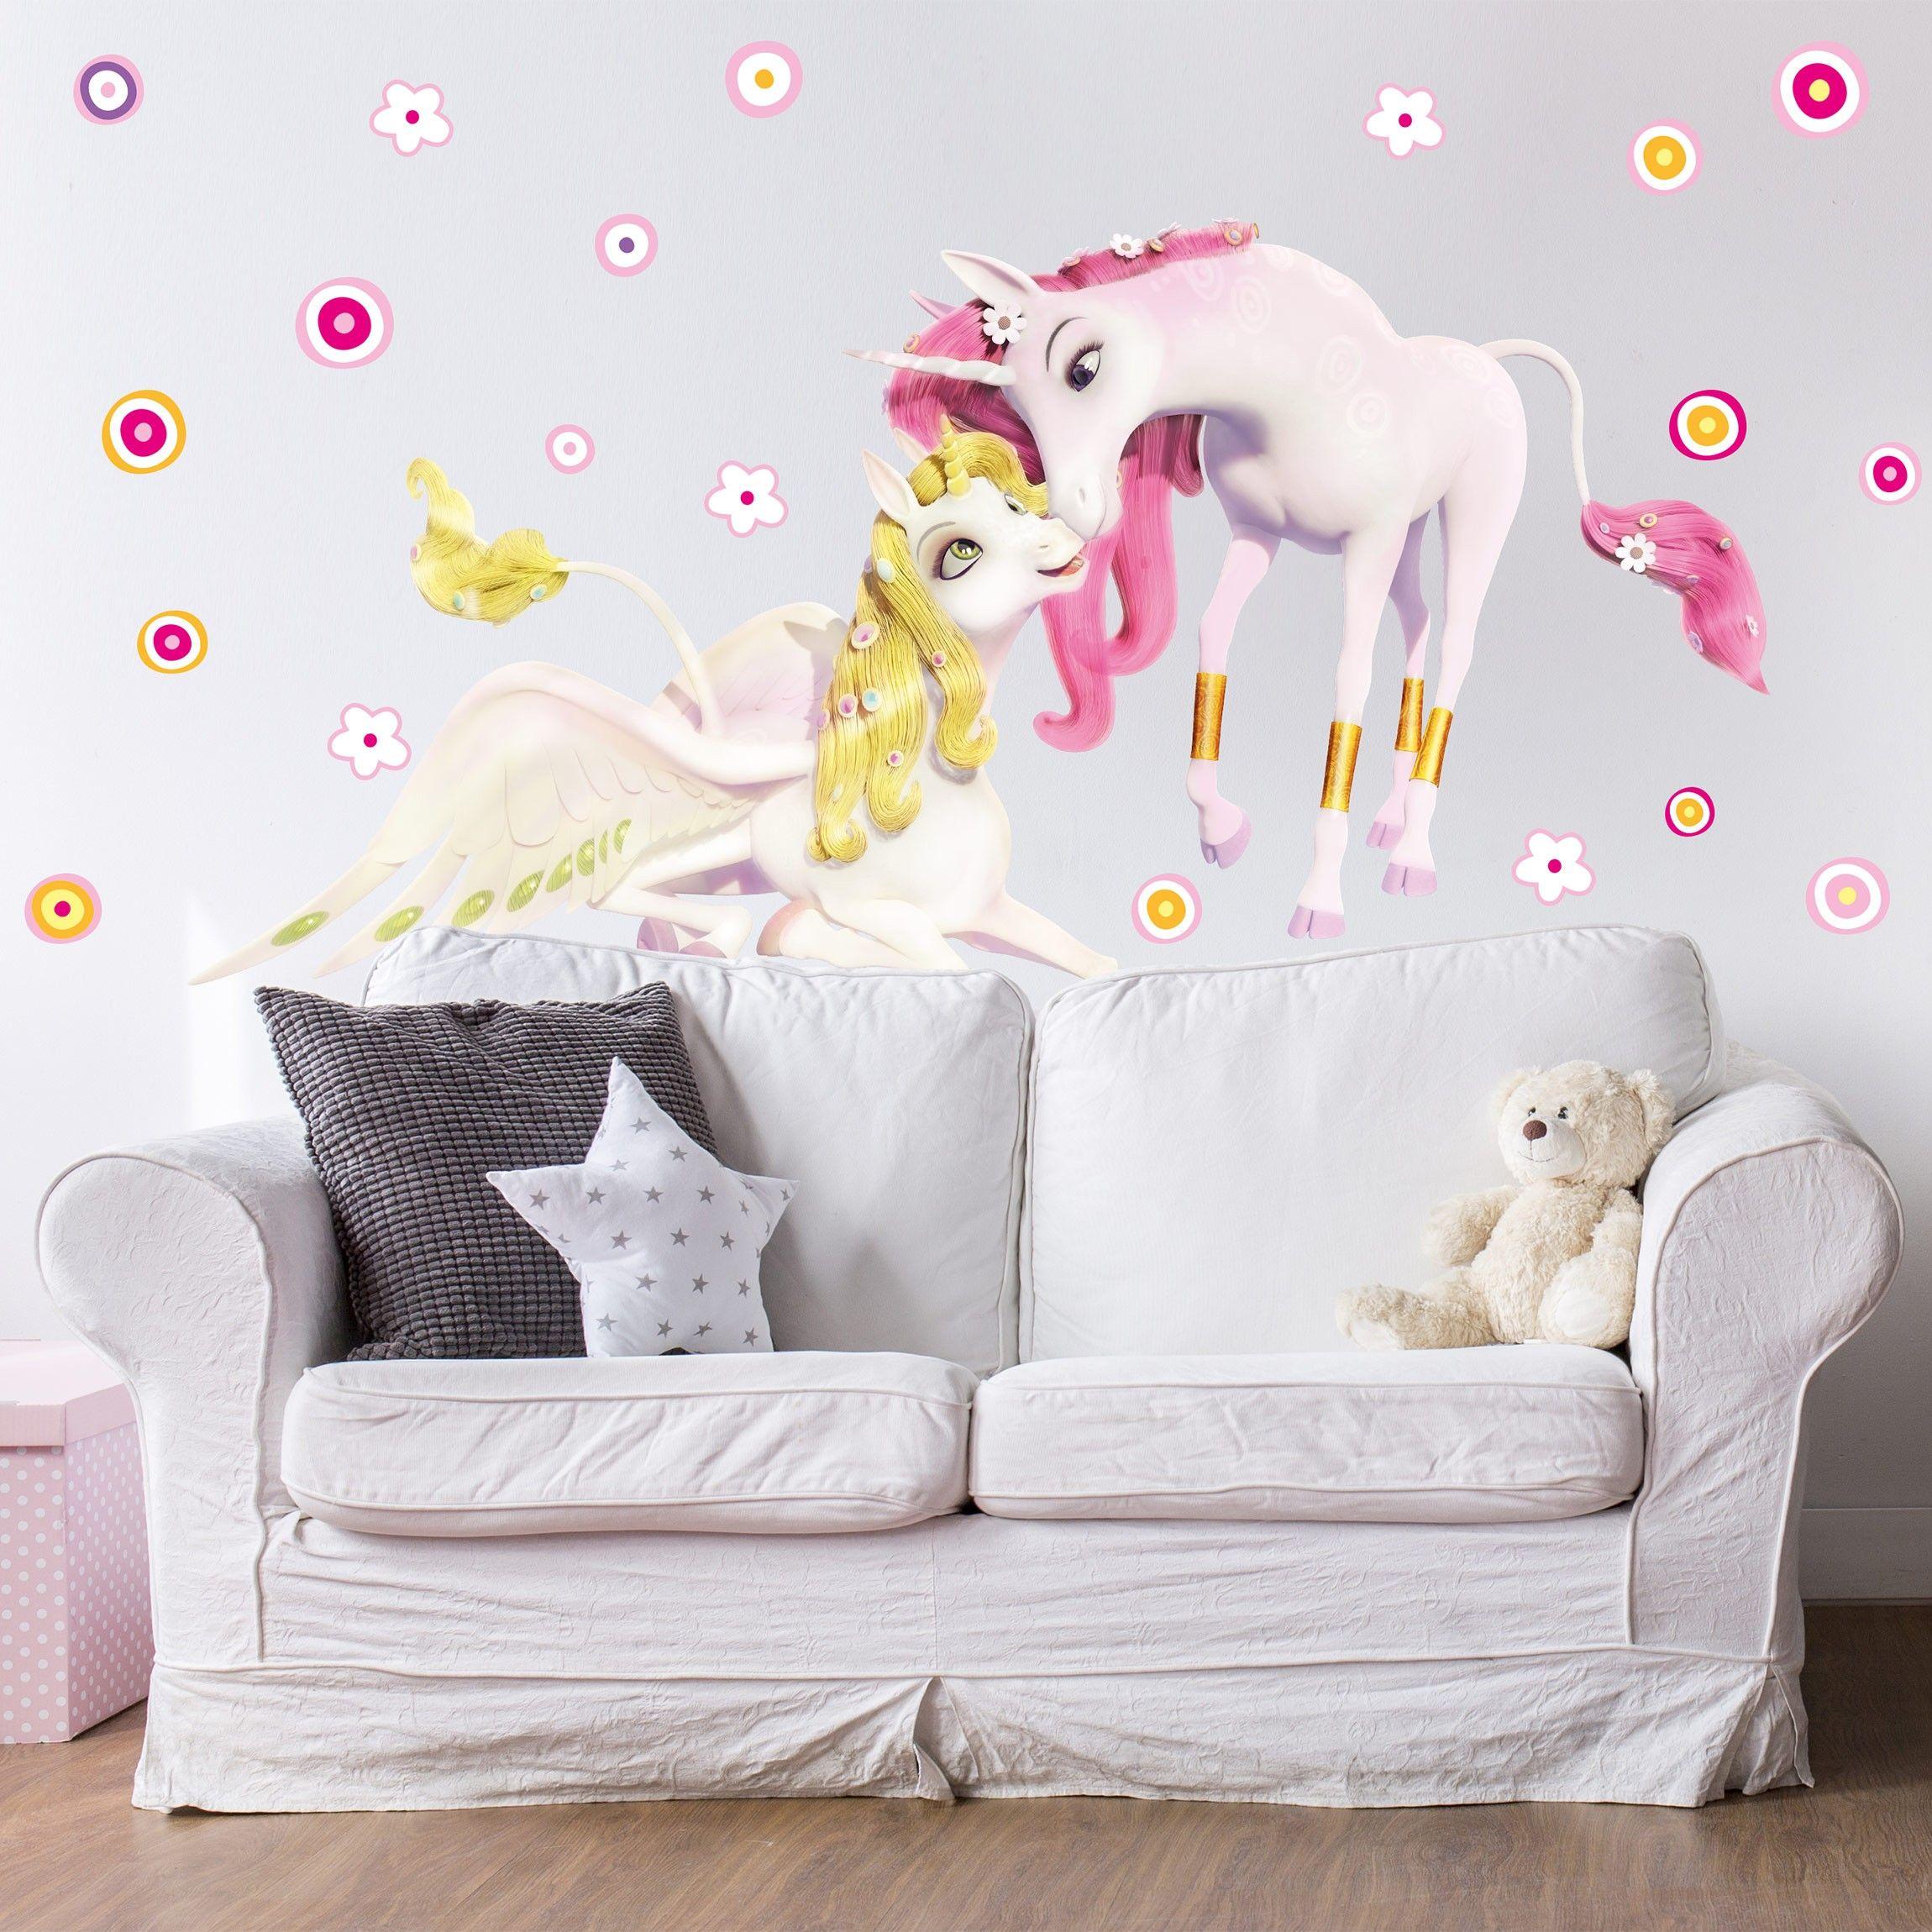 wandtattoo kinderzimmer pink reuniecollegenoetsele. Black Bedroom Furniture Sets. Home Design Ideas